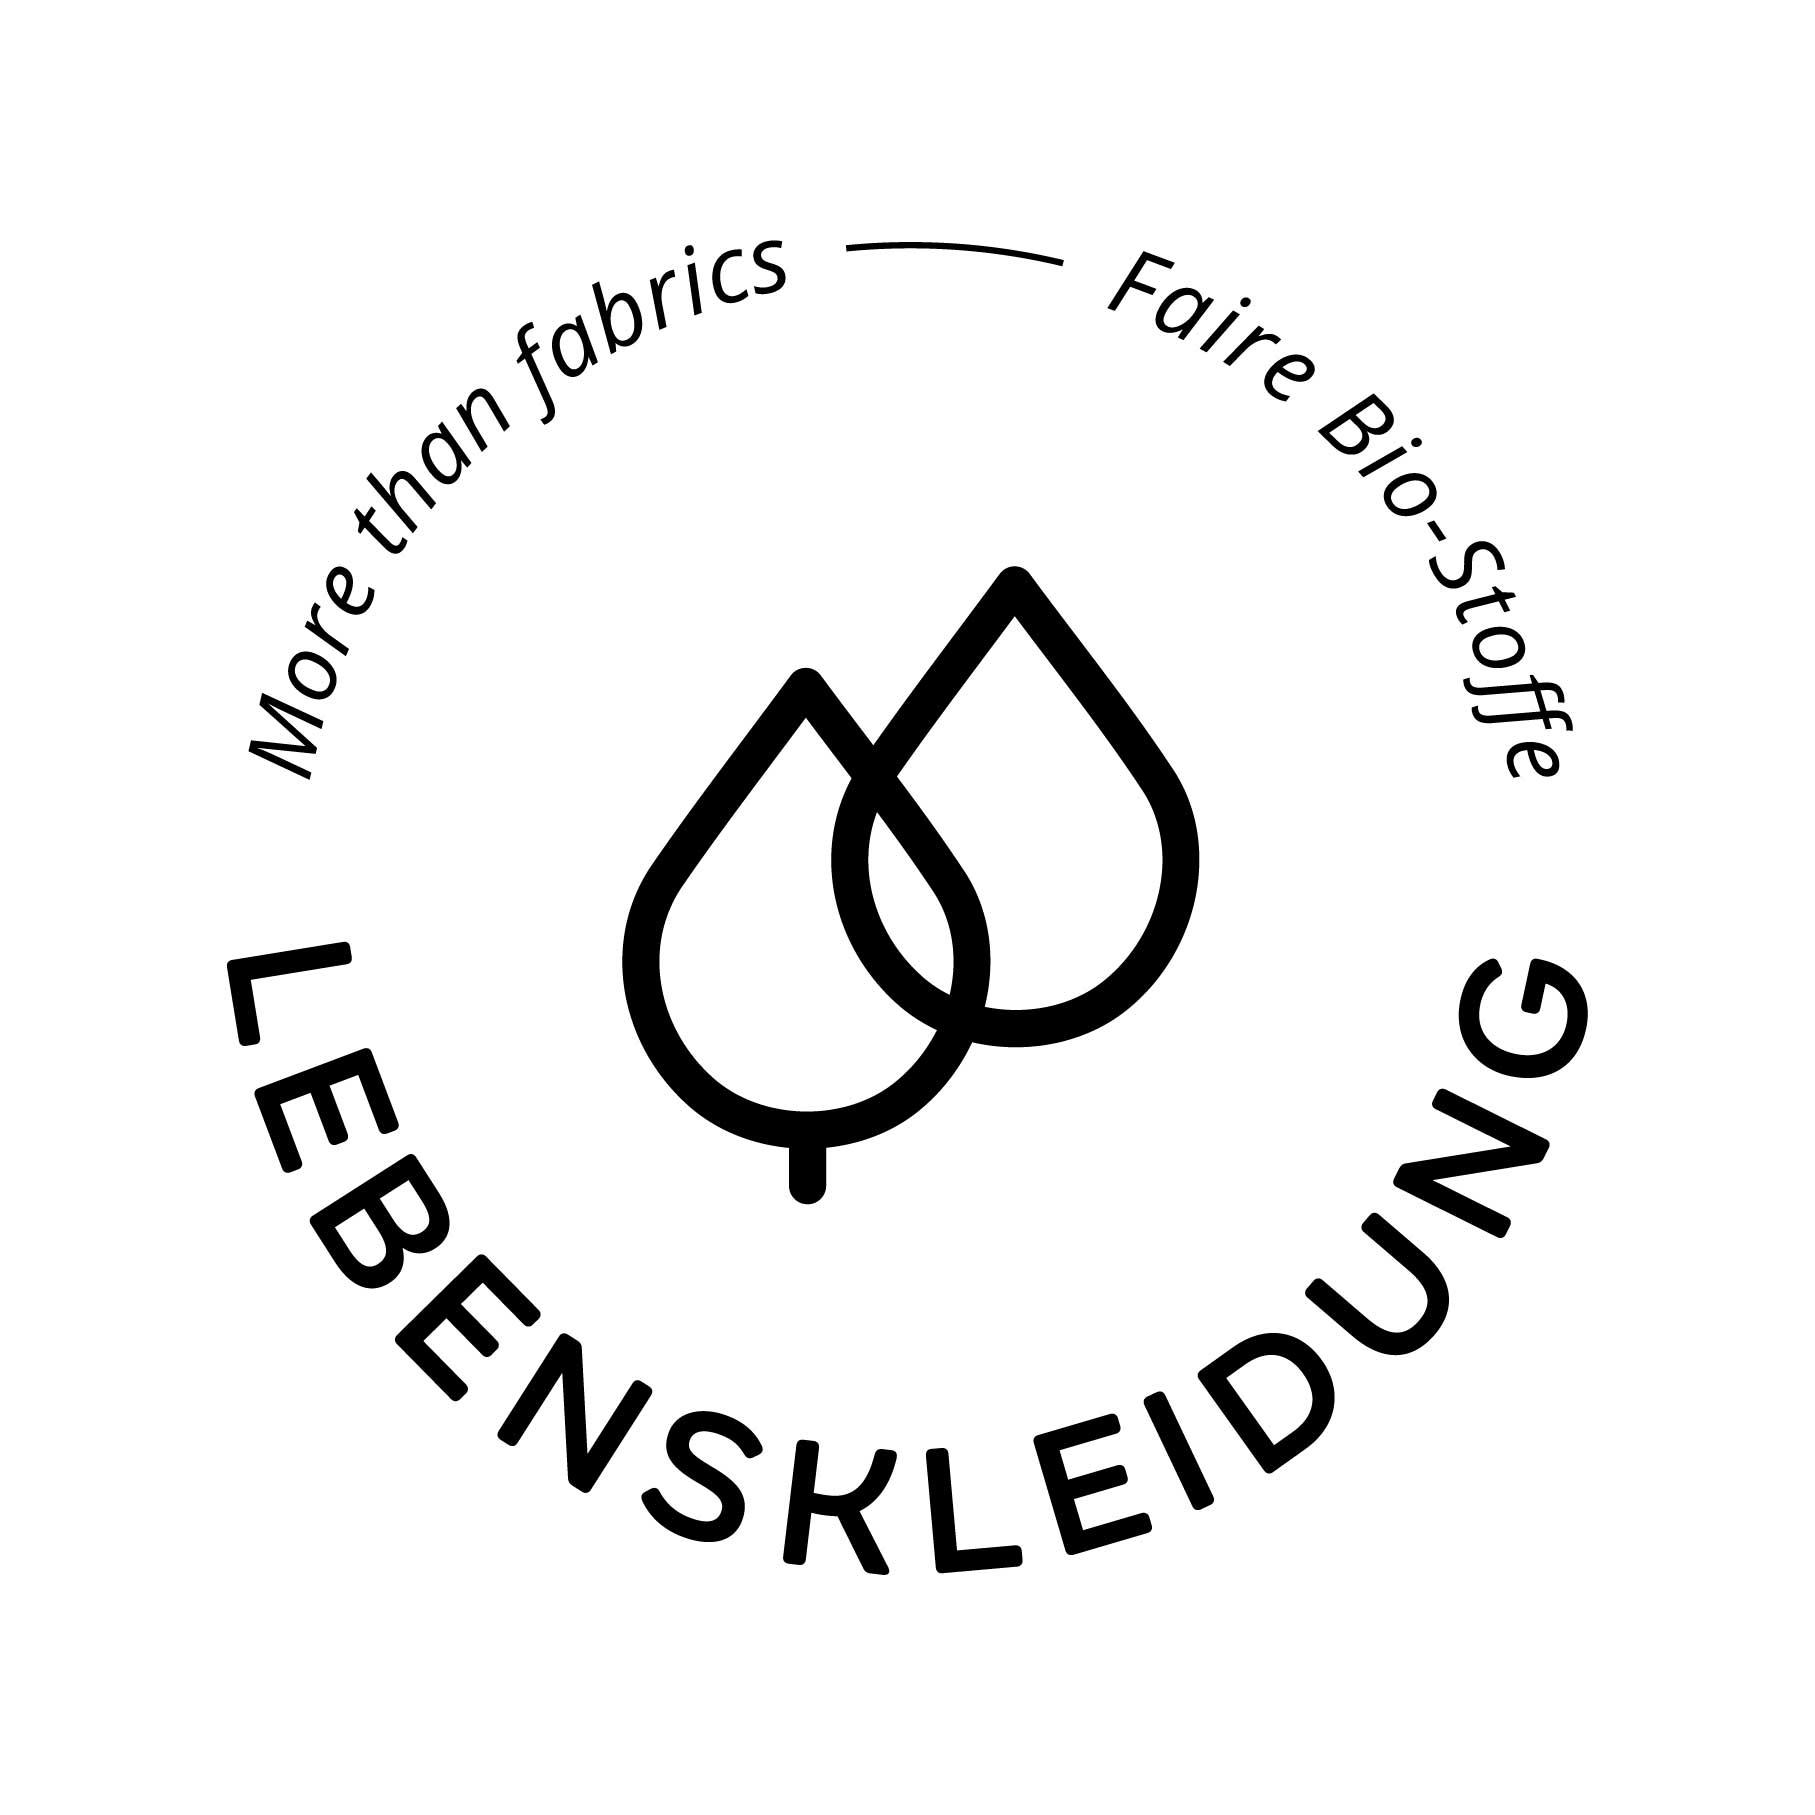 Bio Tissu RIB 2x1 (manchette) - gris grisonnante - clair